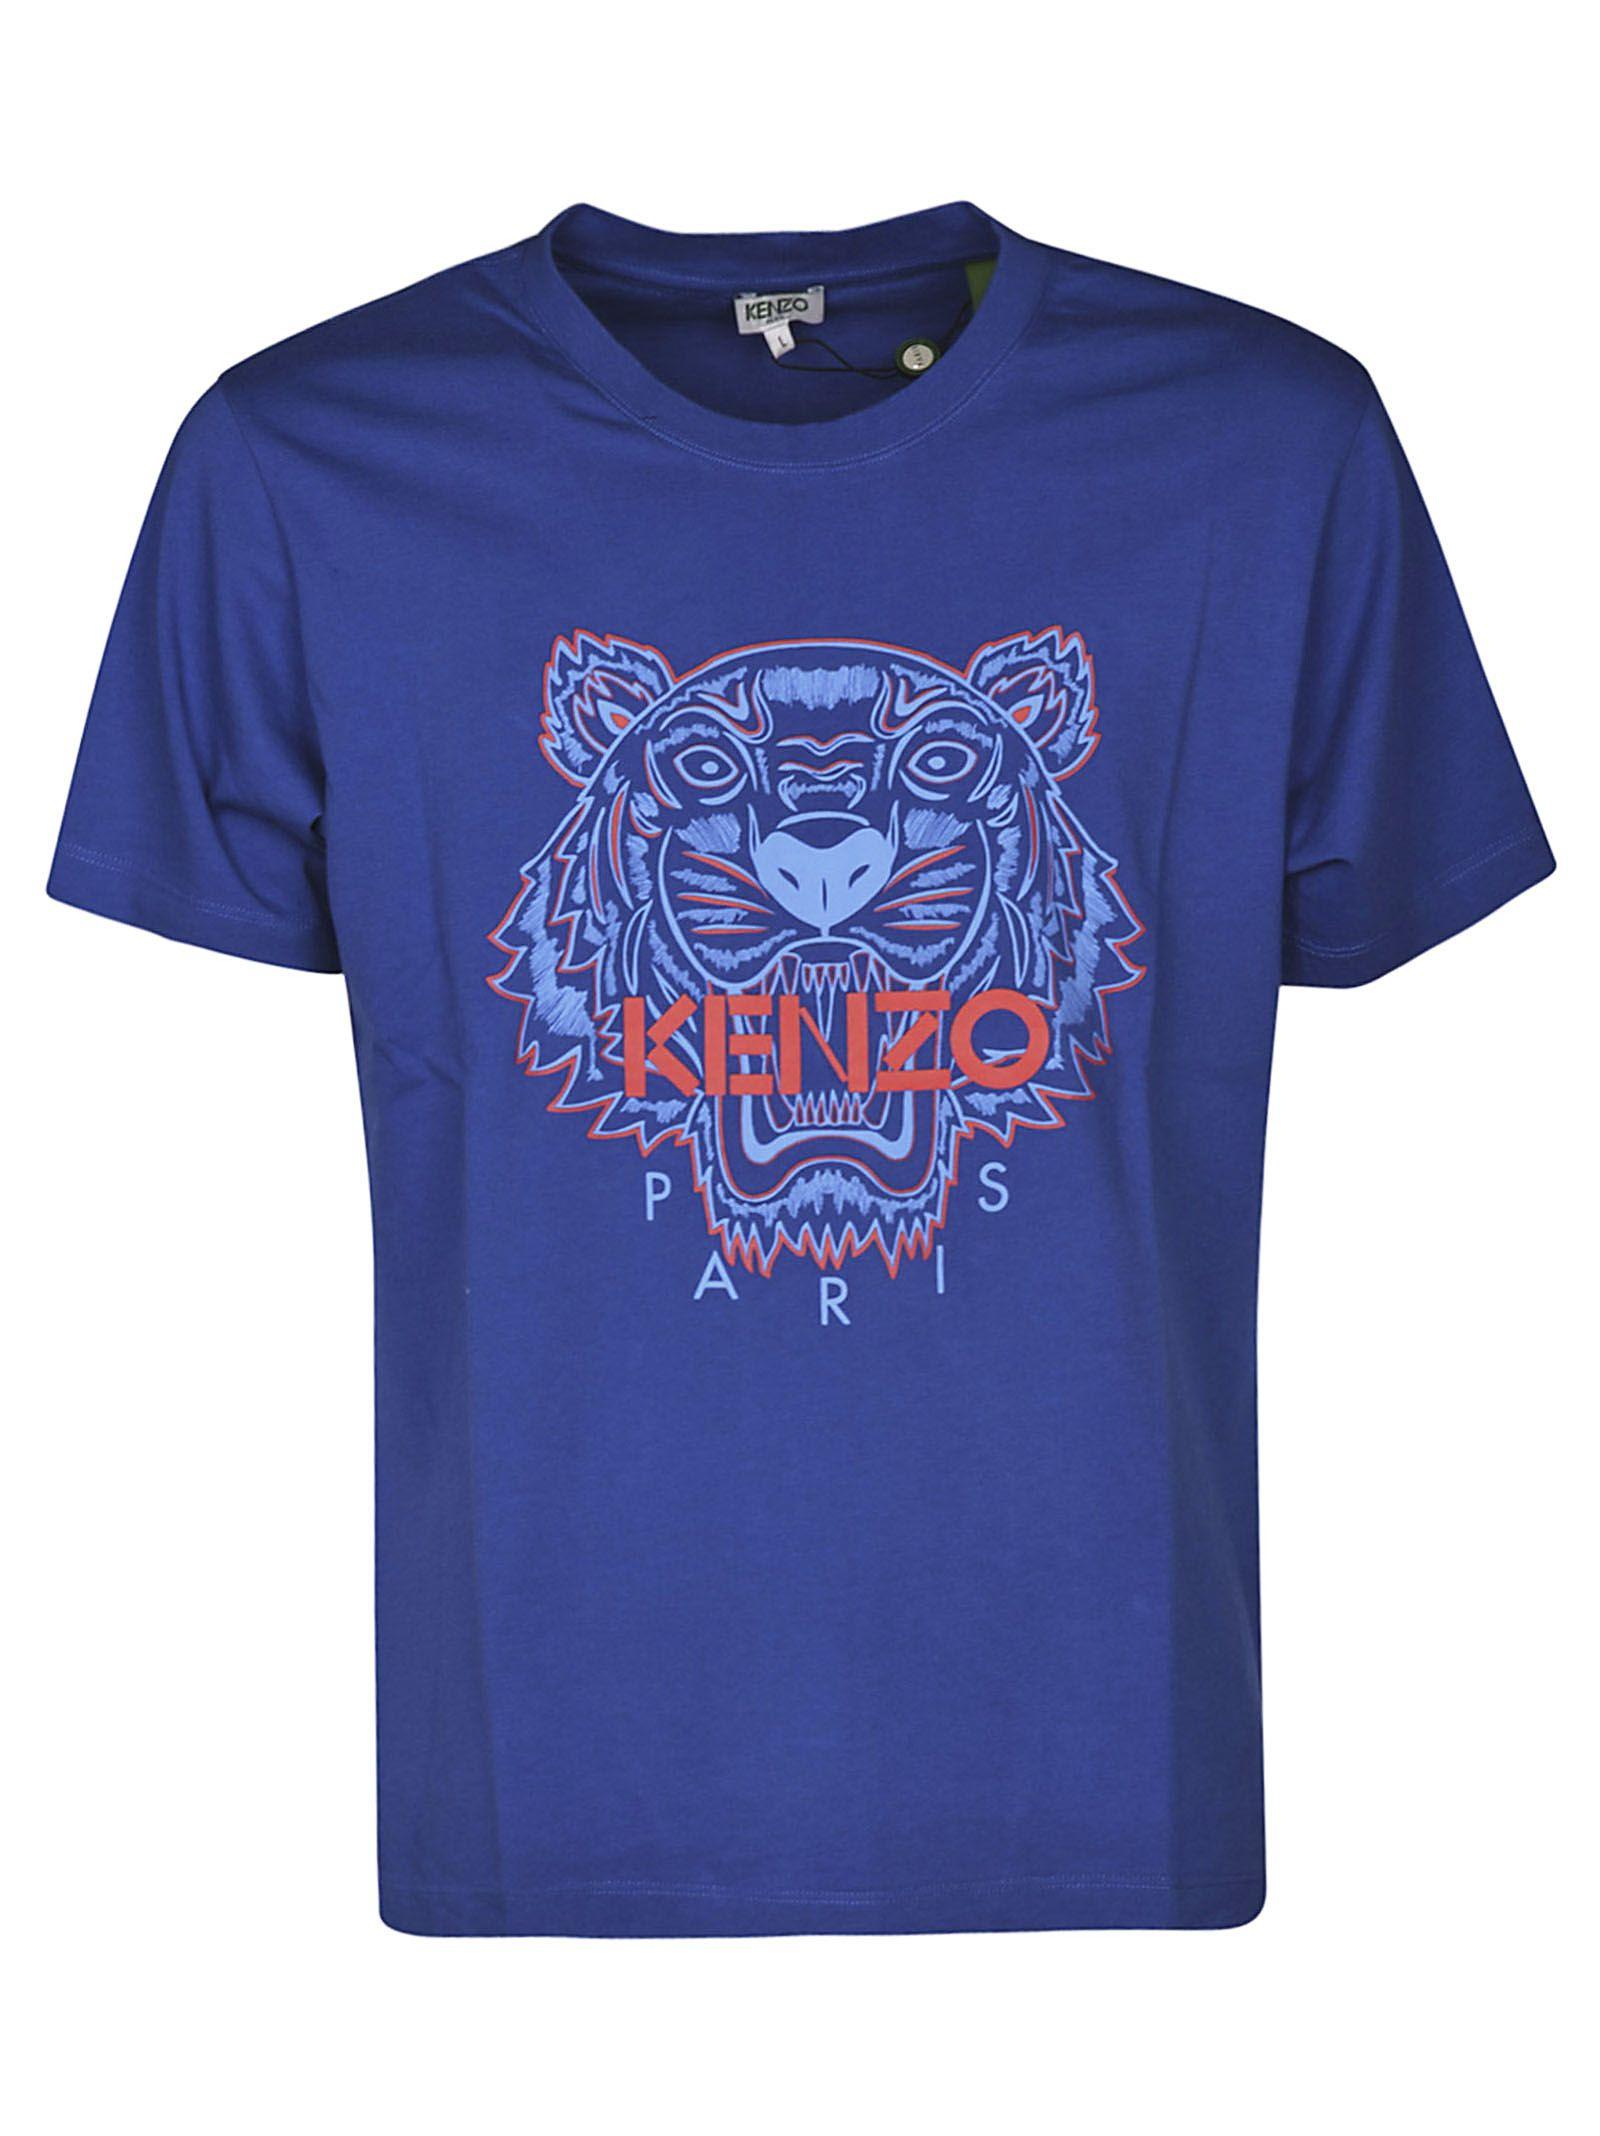 Tiger 10822289Italist Shirt Print T Basic Kenzo EDW9IYH2e